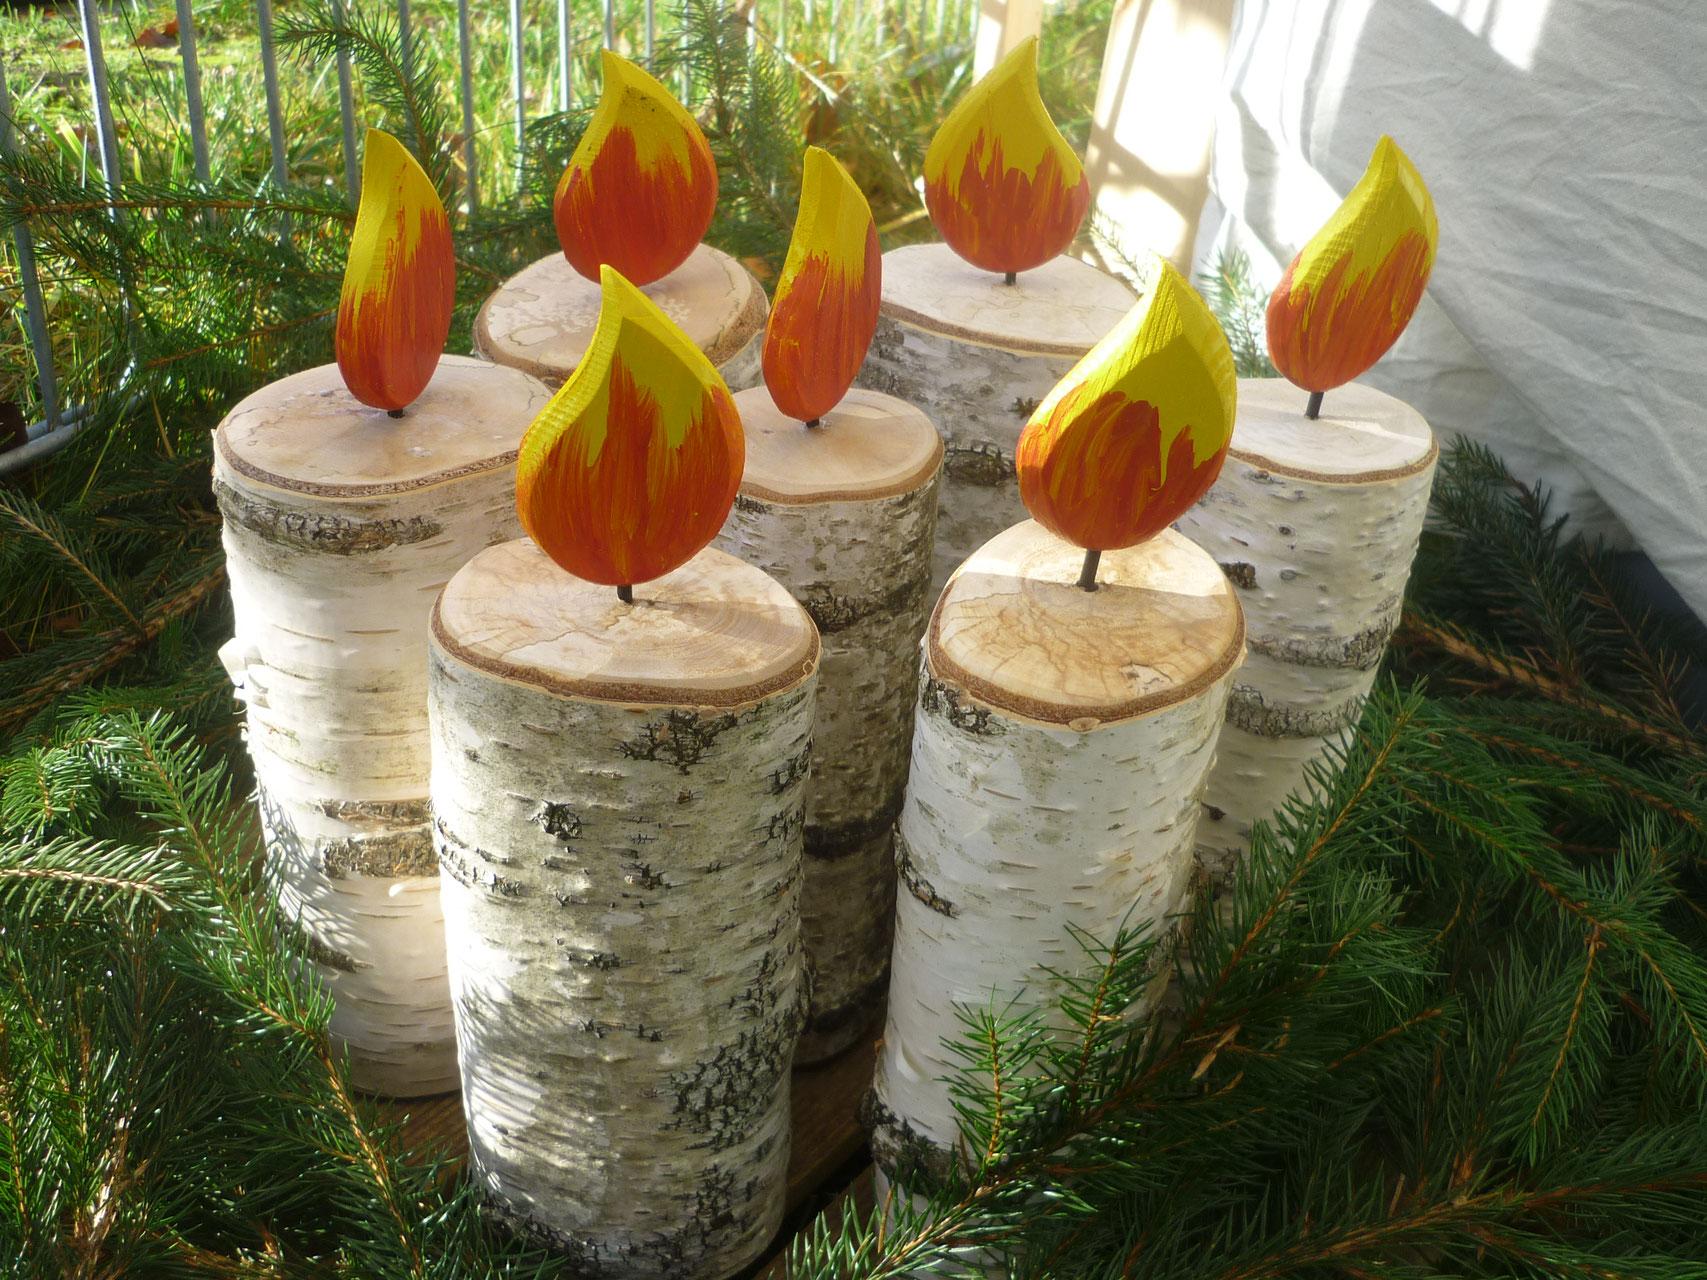 Birkenholz kerze deko aus holz - Deko aus birkenholz ...